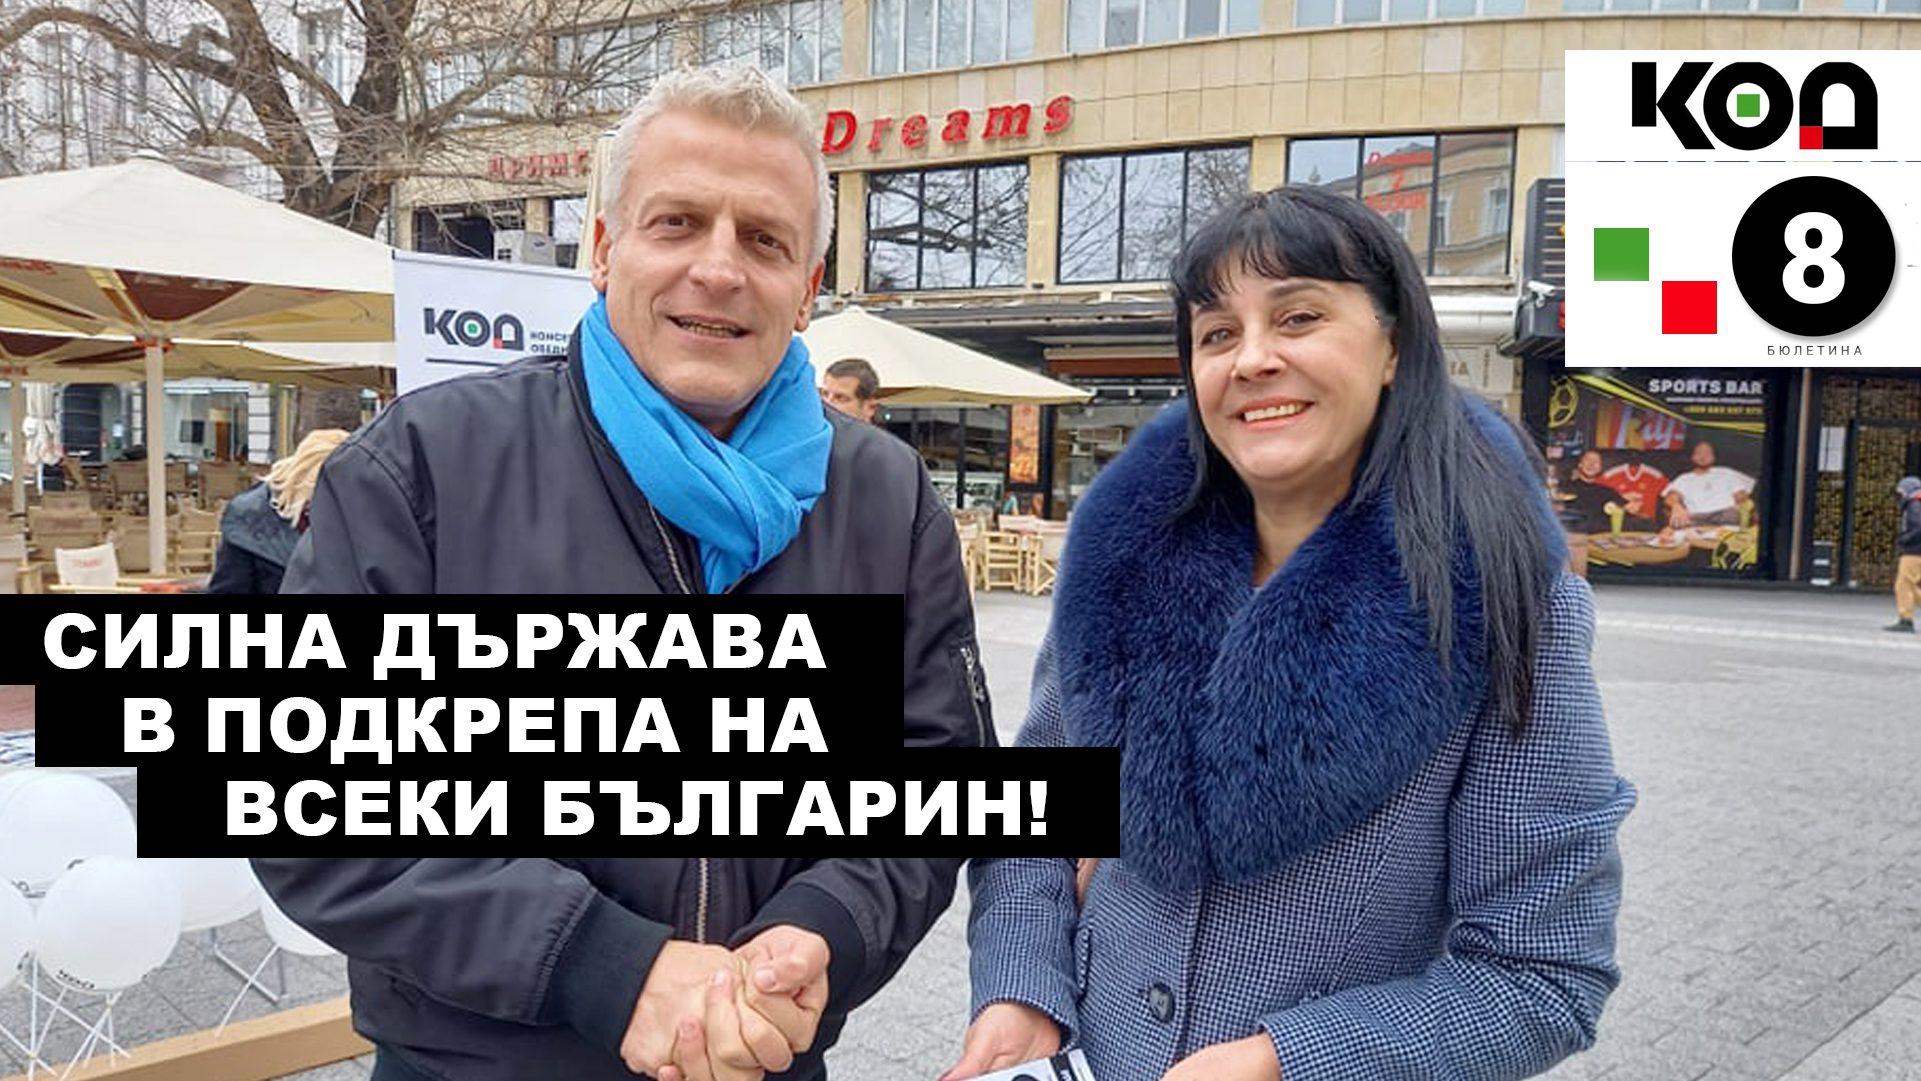 devedzhieva_moskov